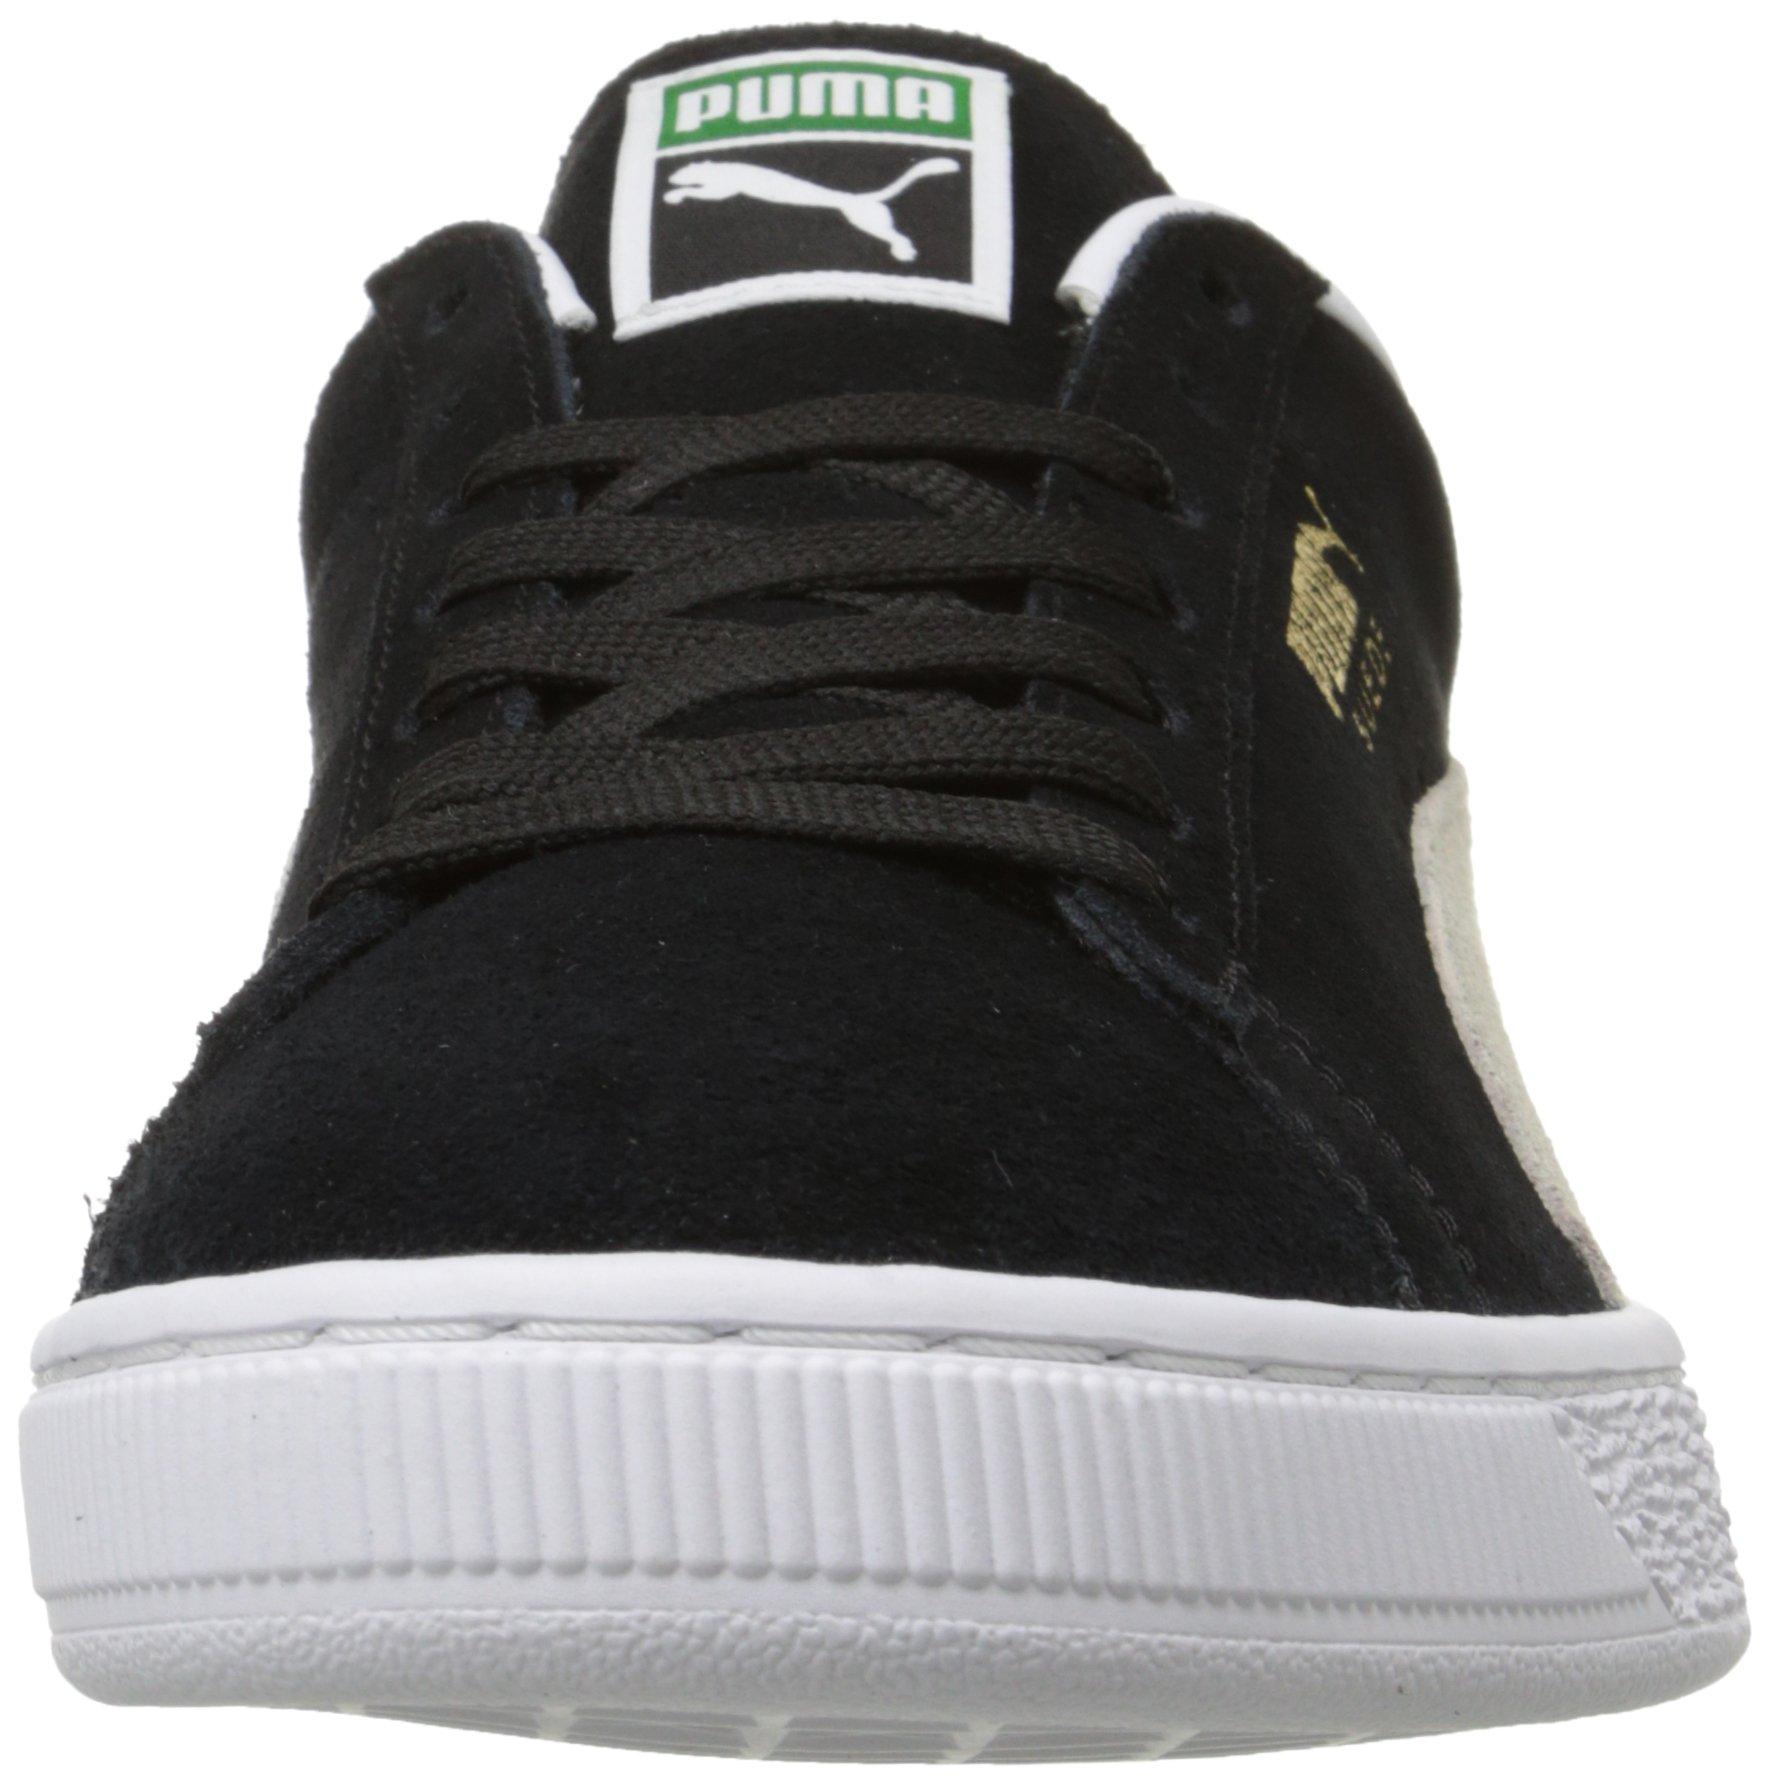 PUMA Suede Classic Sneaker,Black/White,9.5 M US Men's by PUMA (Image #4)